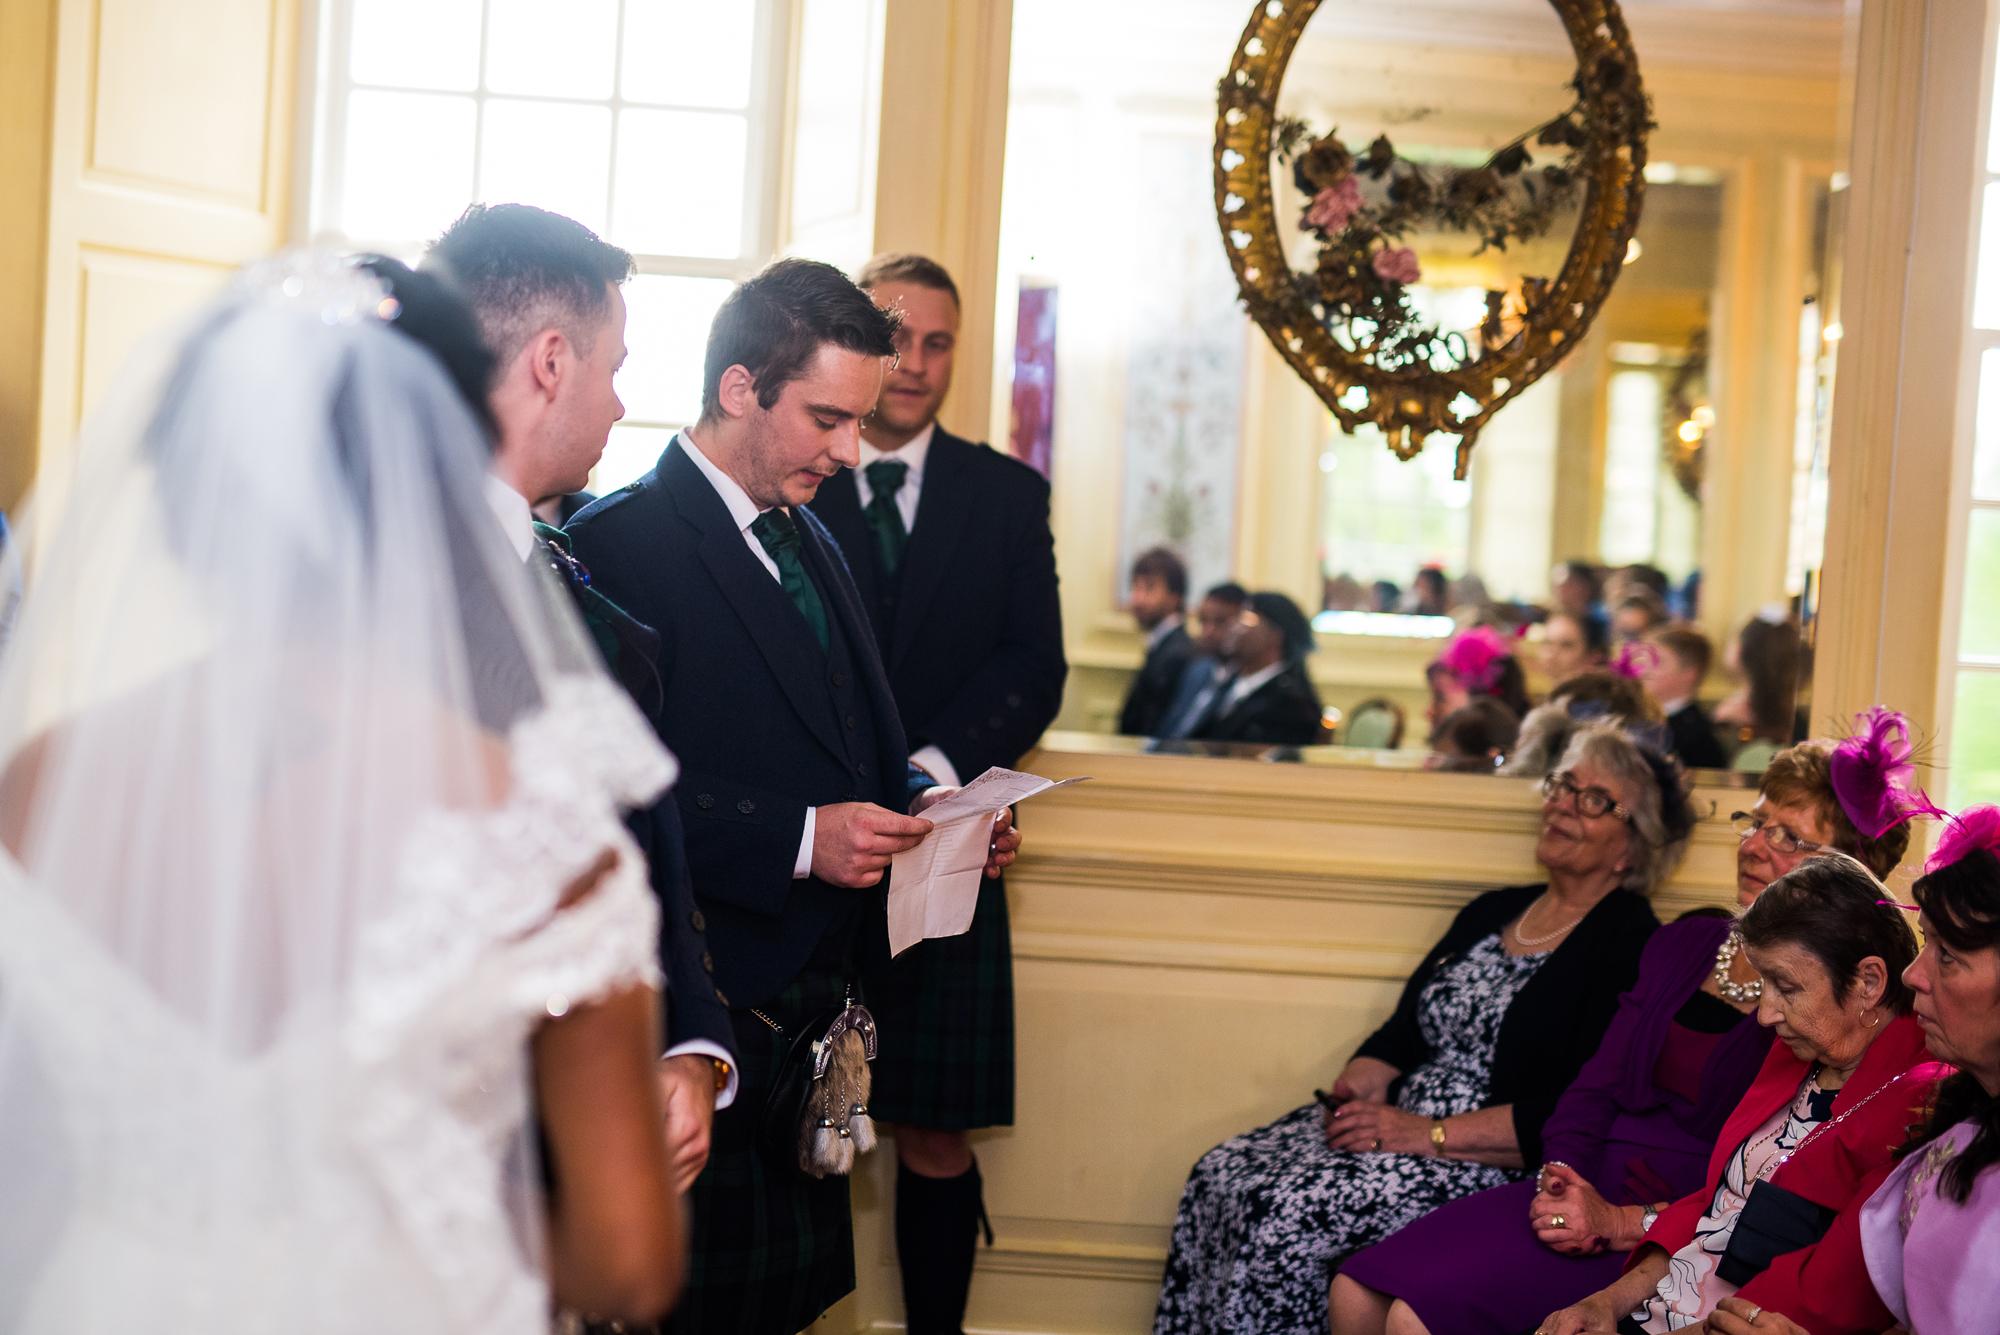 Kev and Shrabani wedding photos (131 of 350).jpg